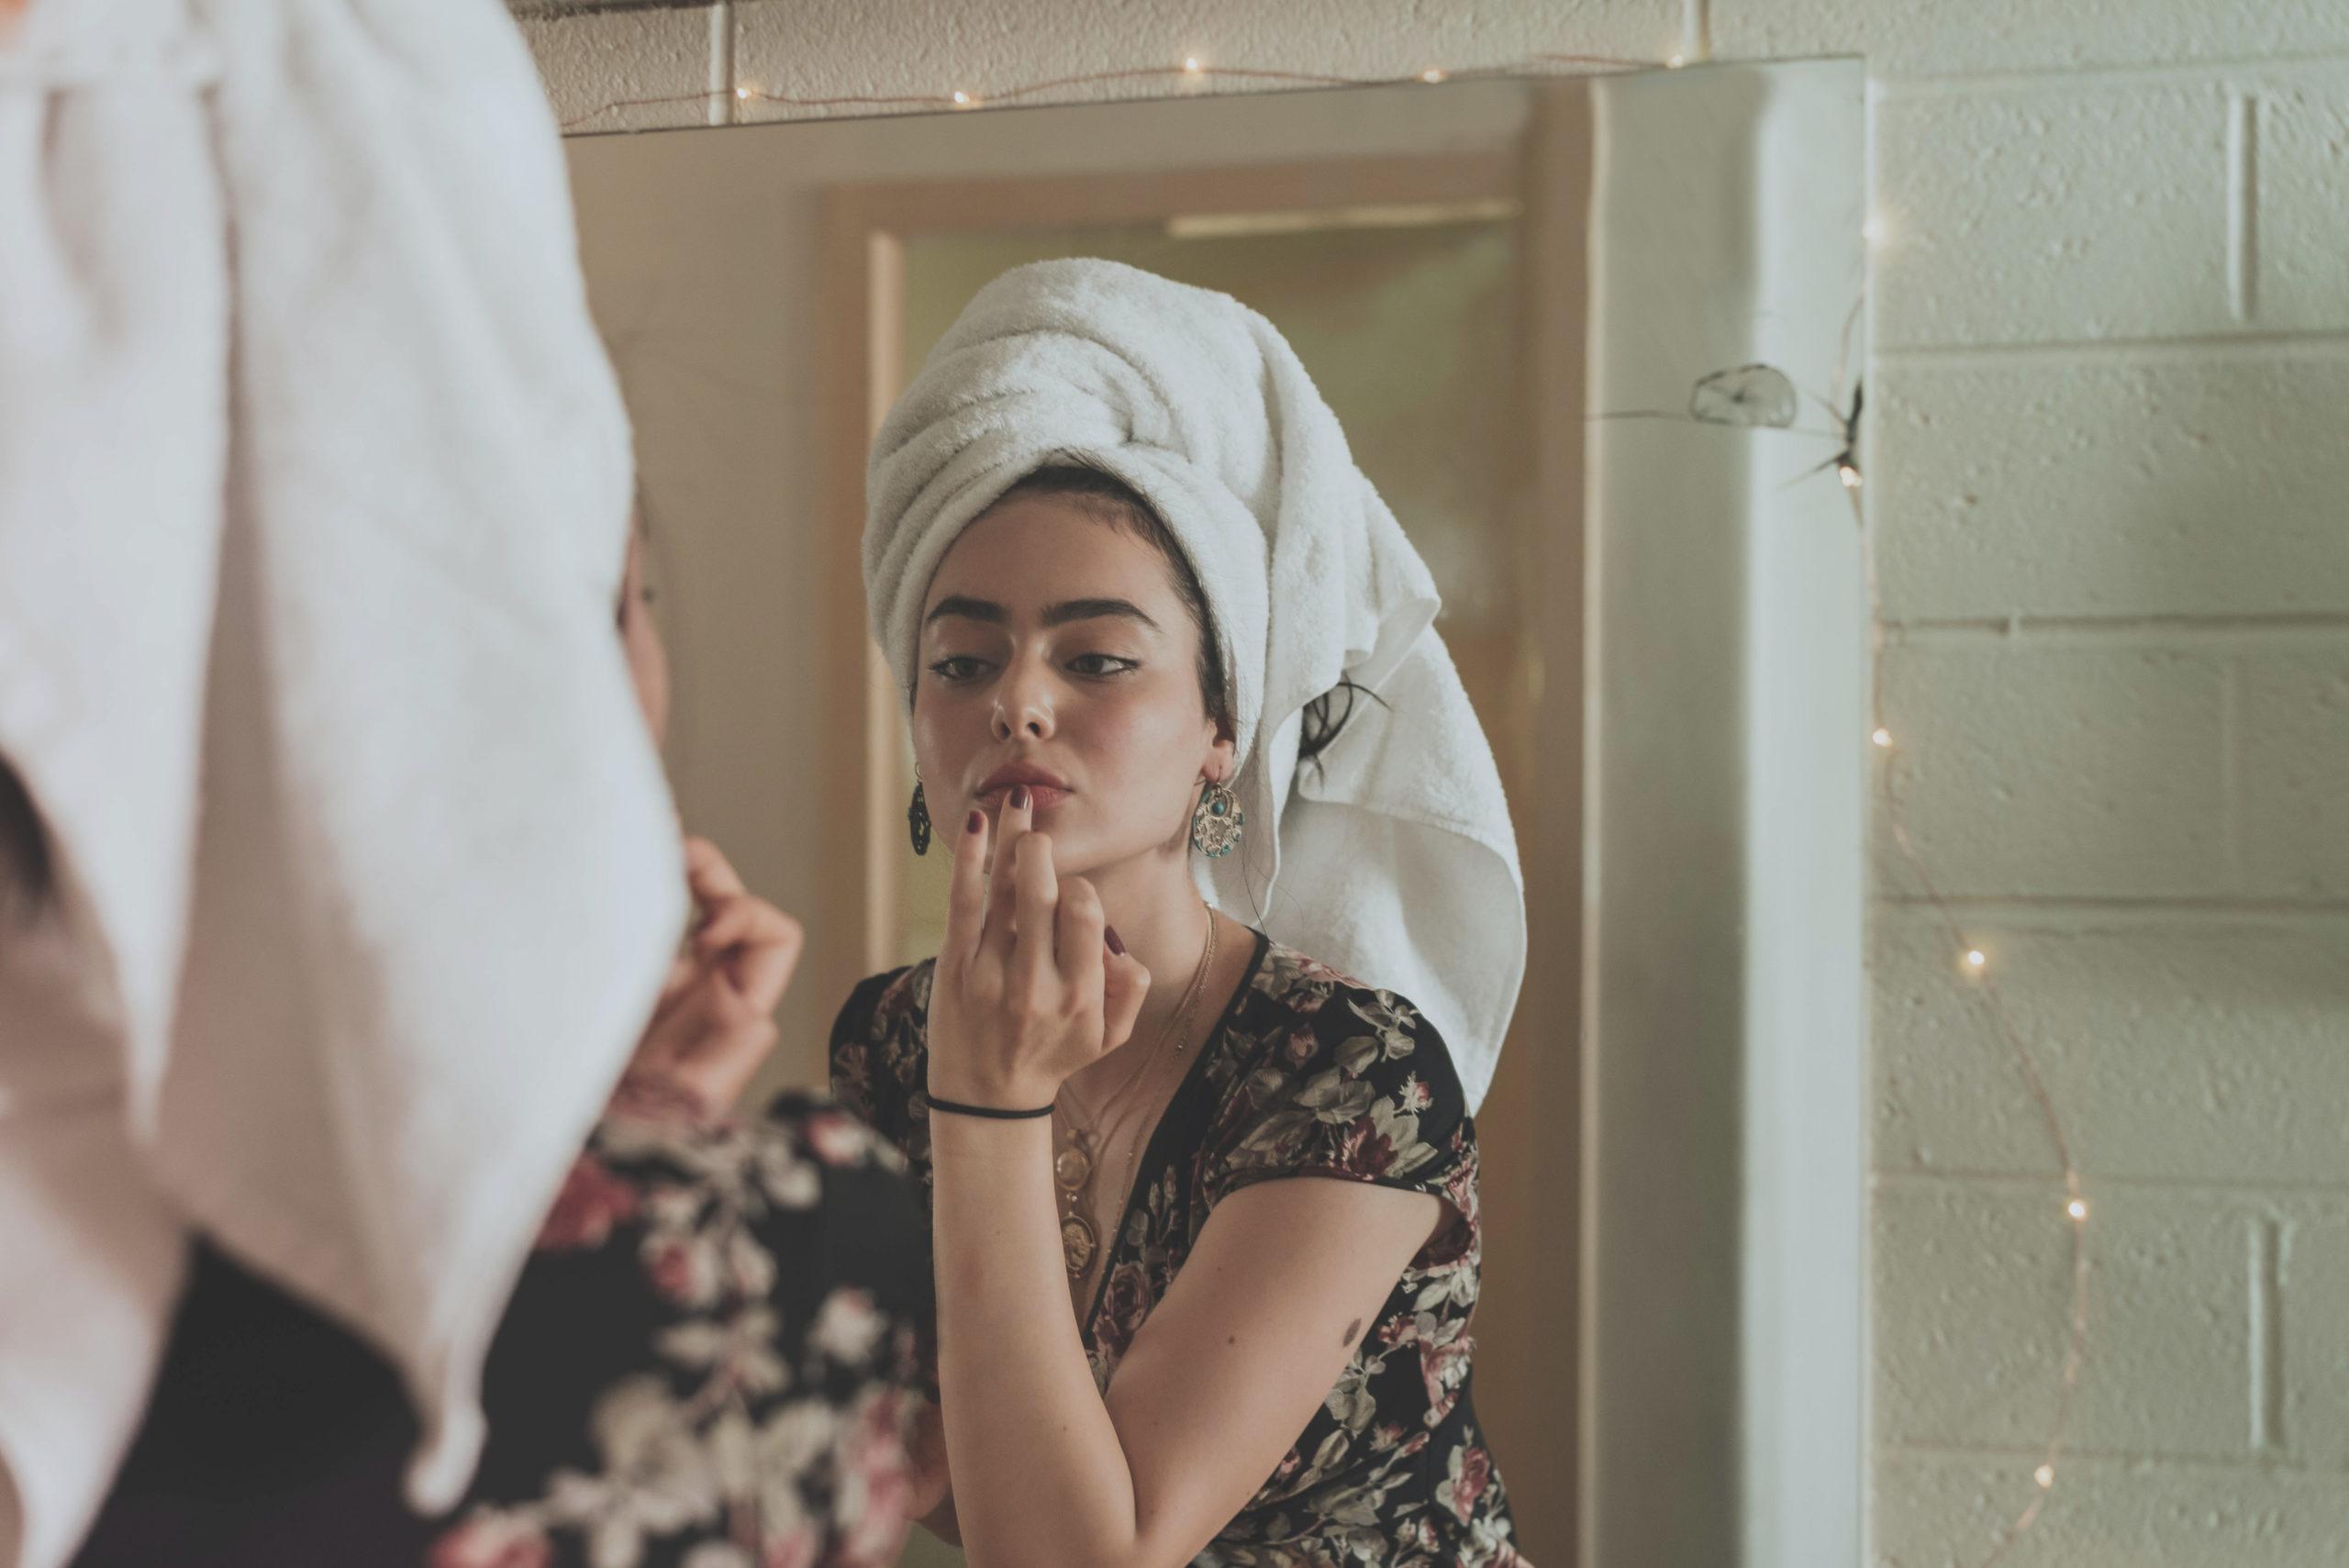 Woman with towel on head applying lip balm in the bathroom mirror